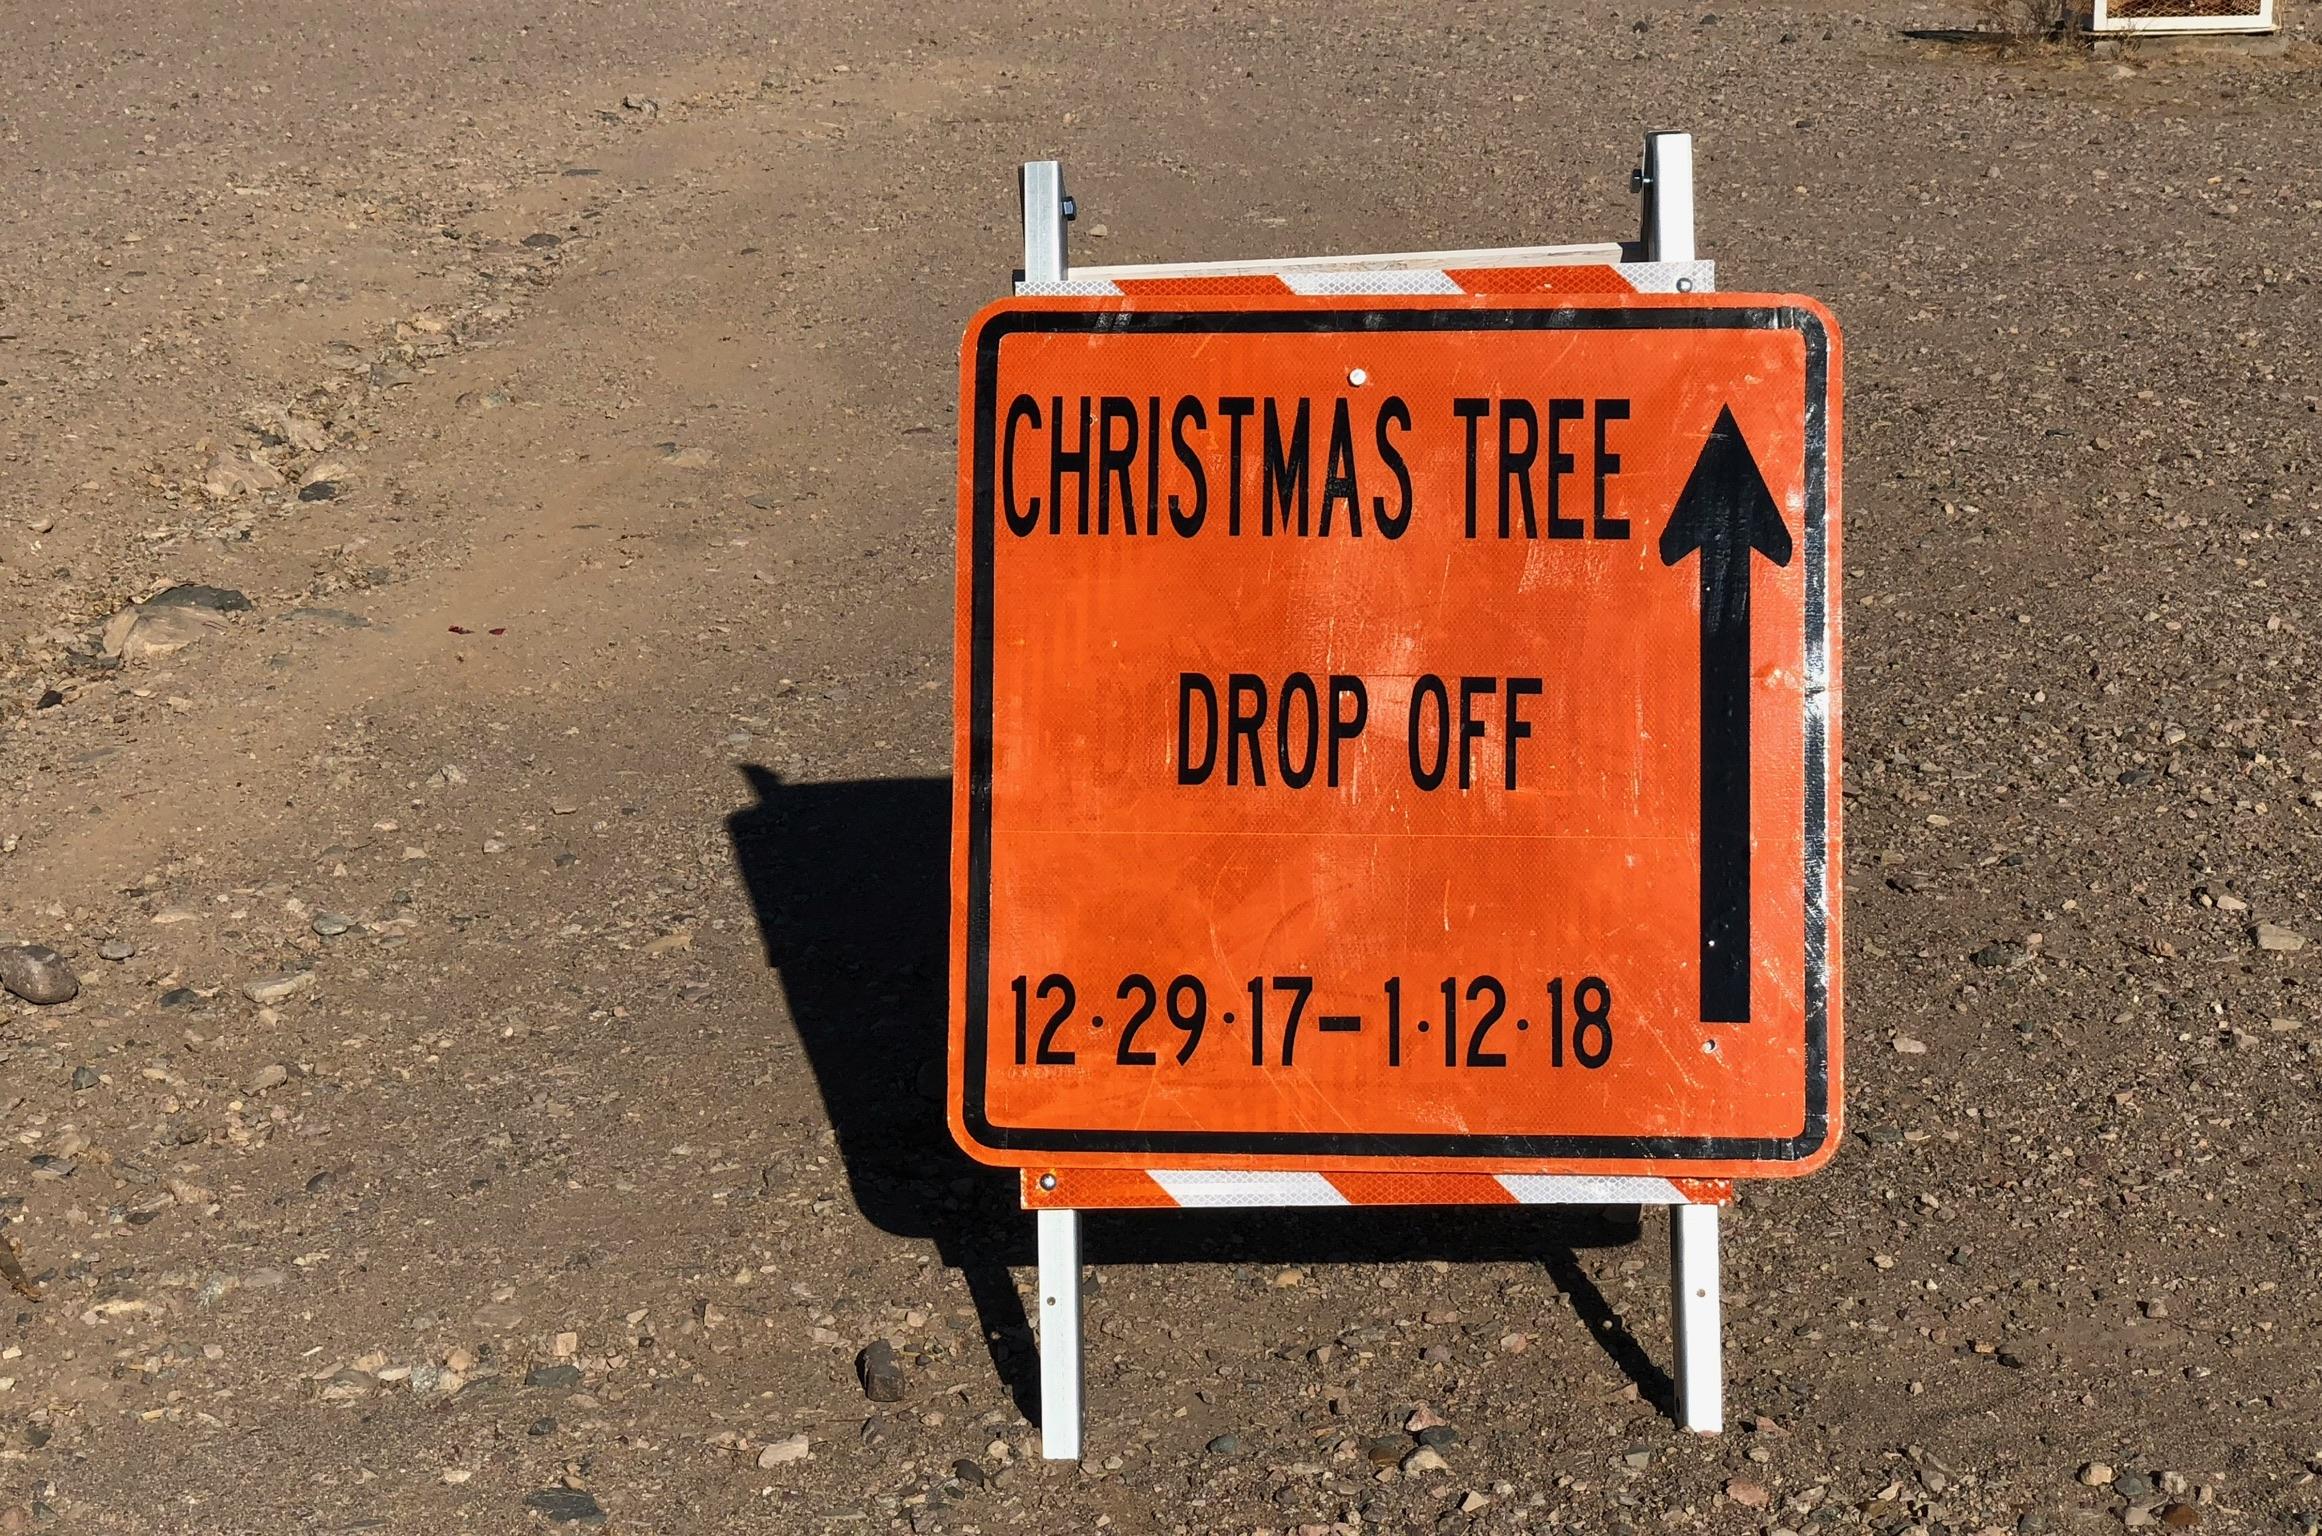 Christmas Tree Recycling Starts Friday